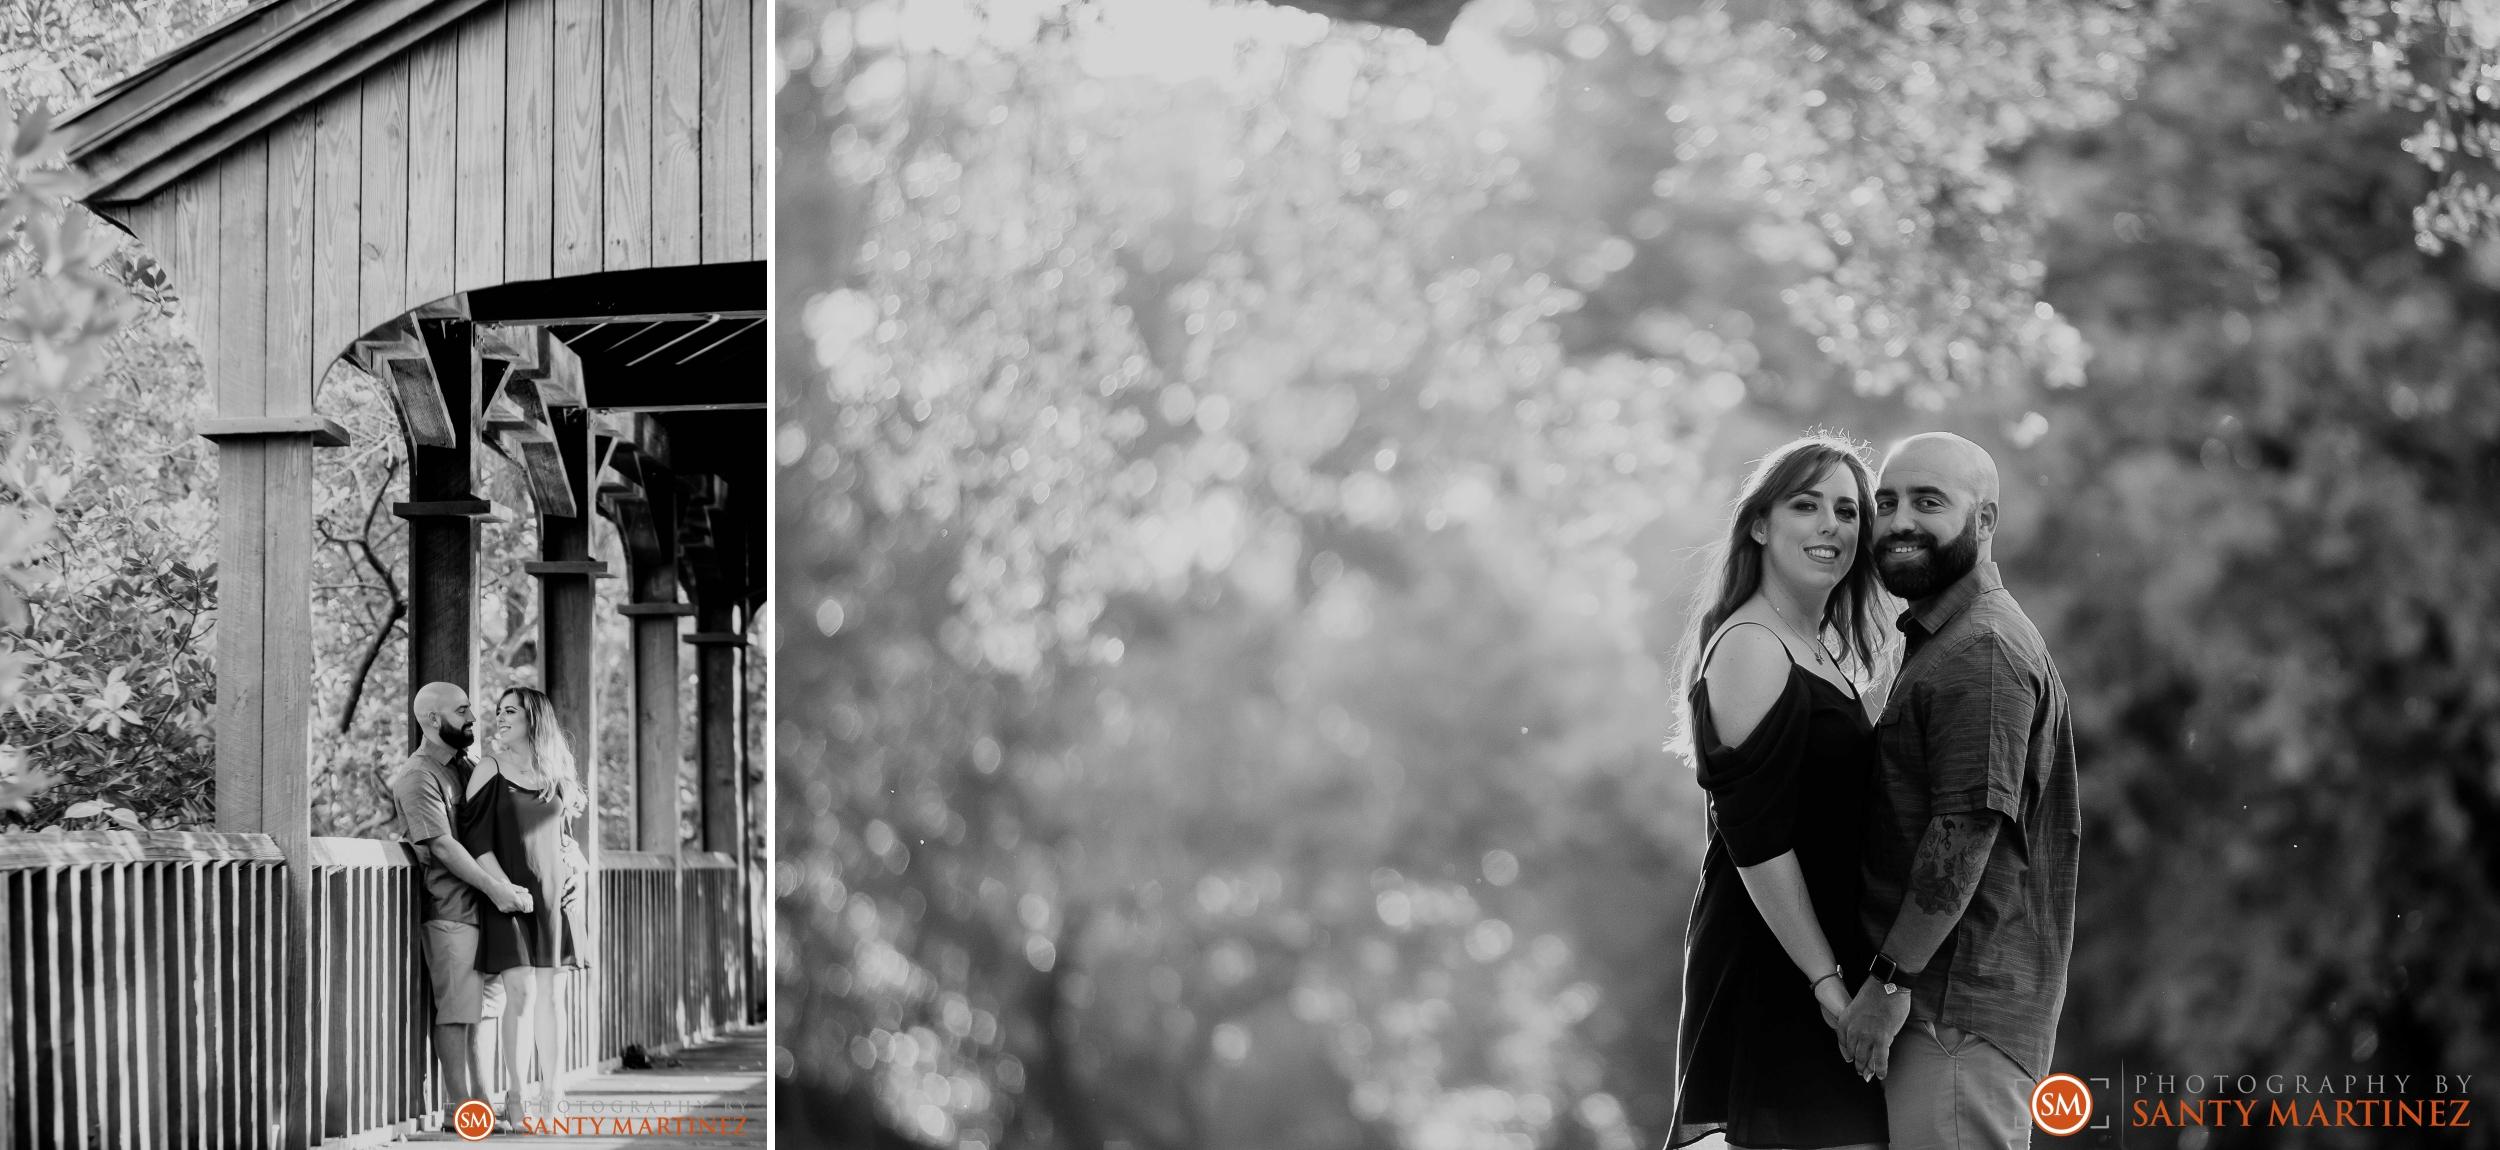 Engagement Session - Greynolds Park - Santy Martinez Photography 2.jpg